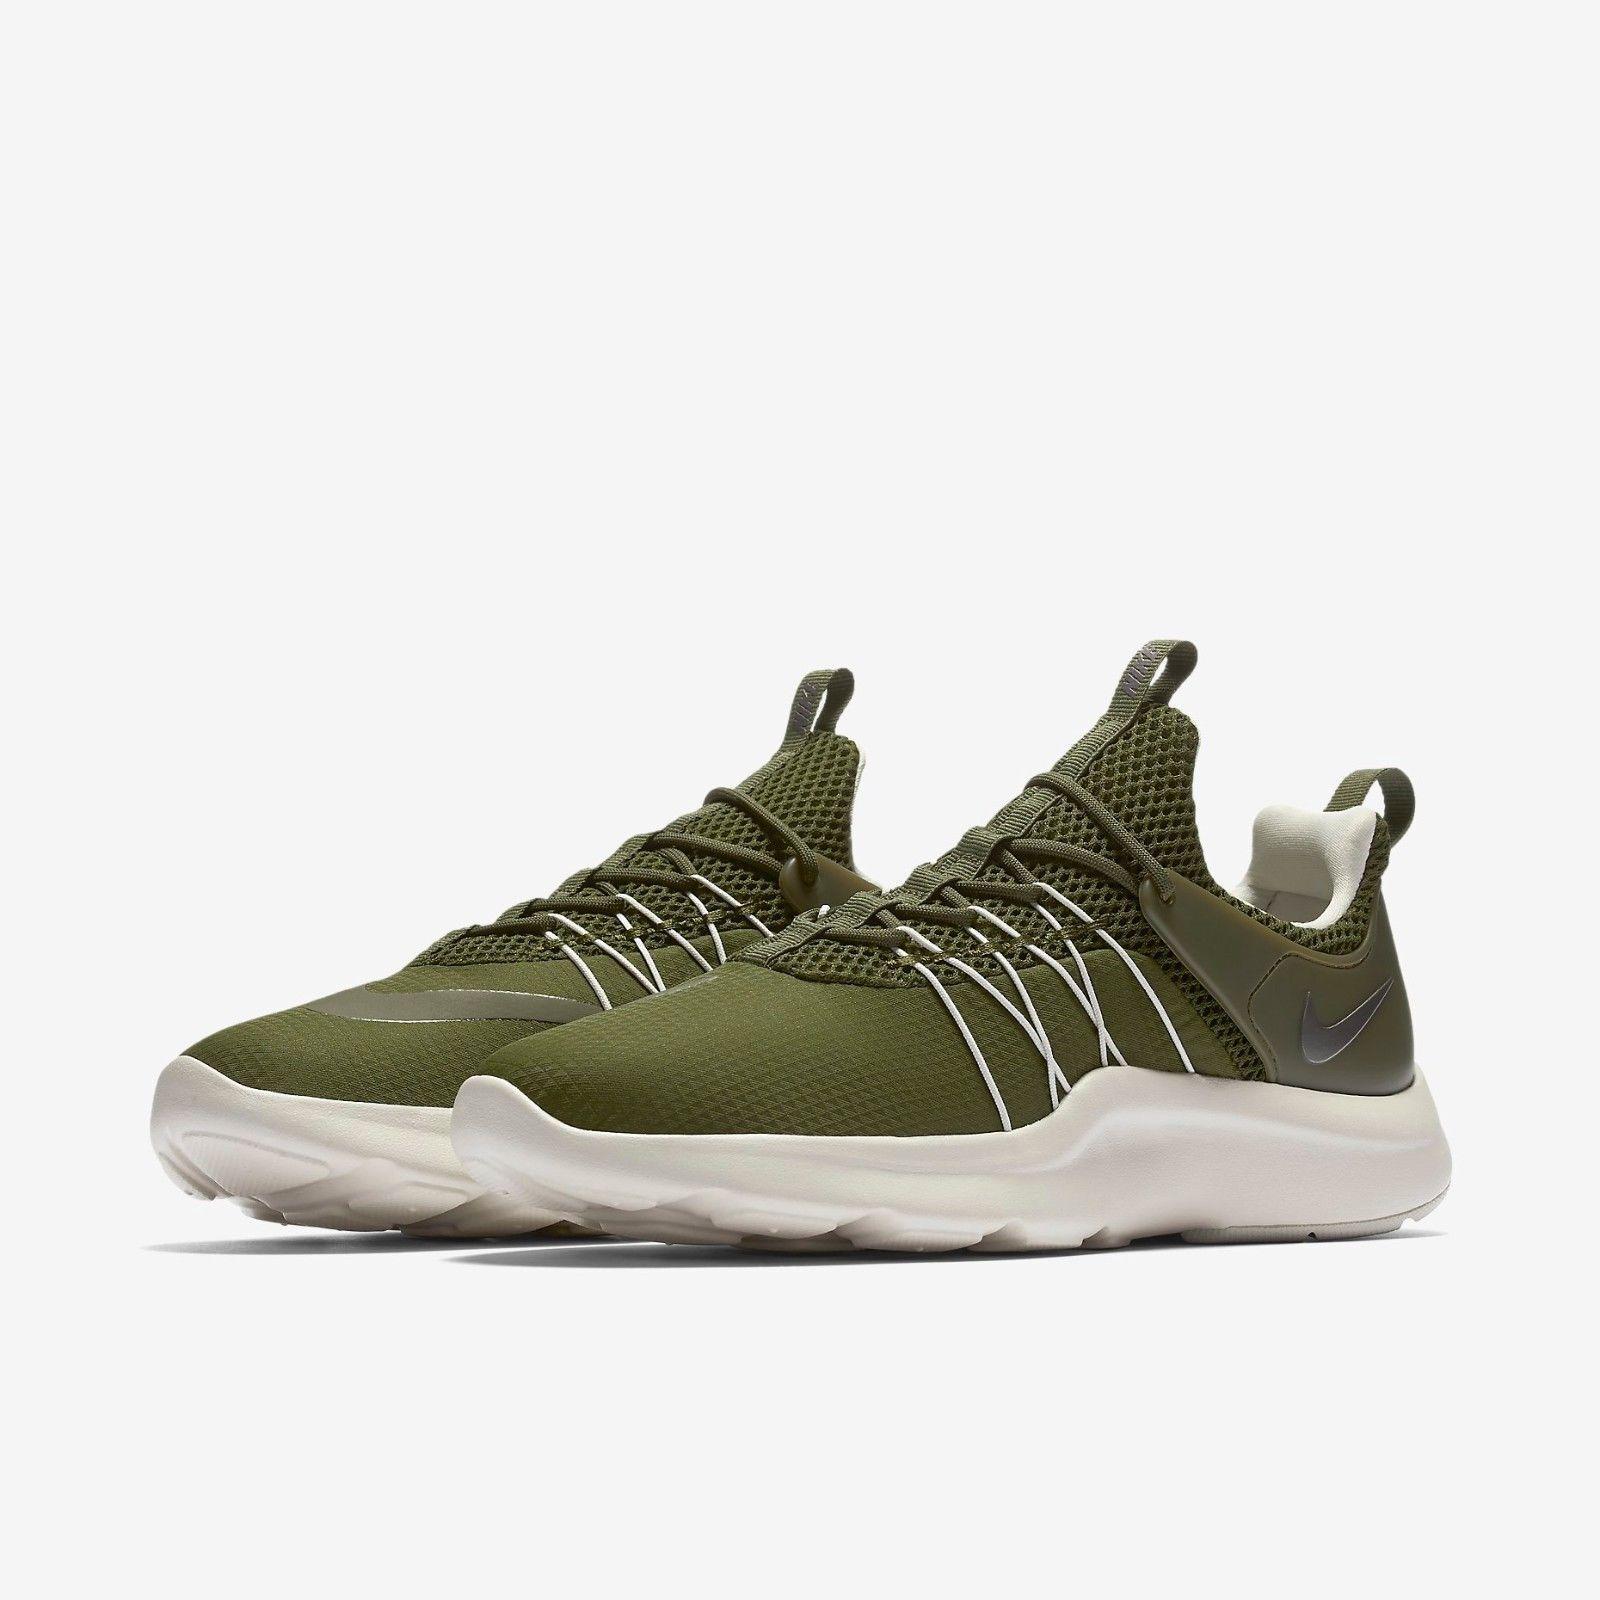 Nike Darwin Running Training Chaussures Vert Olive Vert Chaussures 819959-3017.5  b6212e 792a3917443b